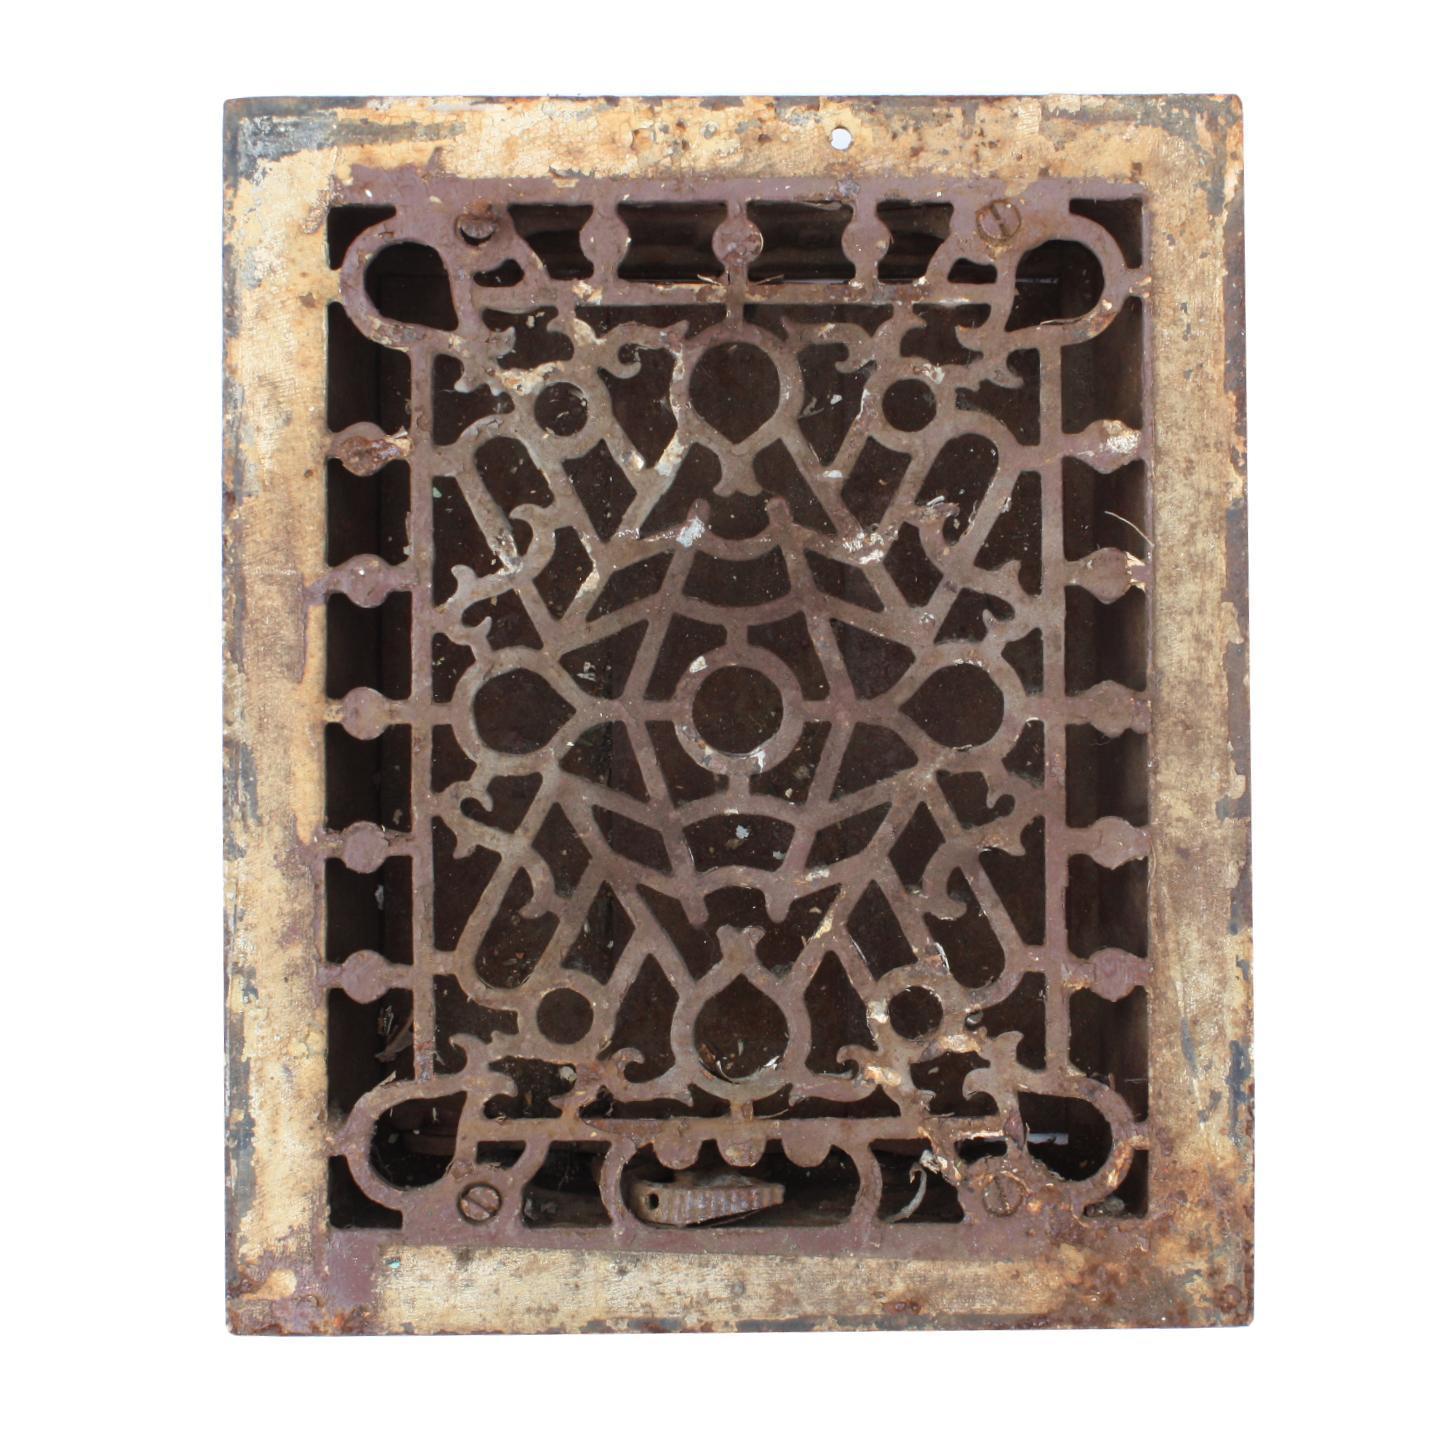 Playful Antique Cast Iron Heat Register